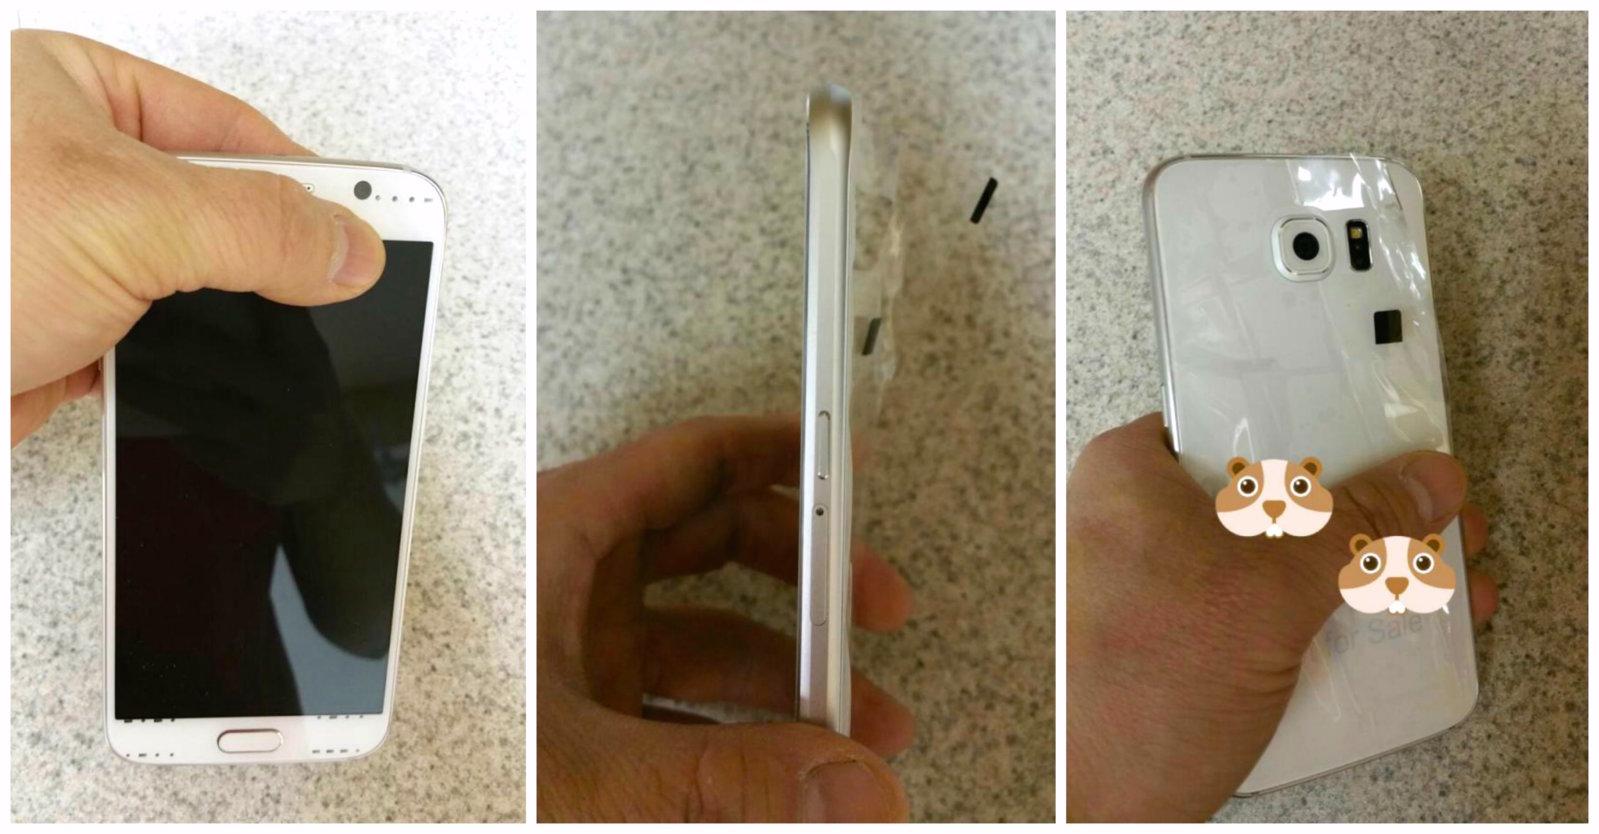 Samsung-Galaxy-S6-leak-1.jpg